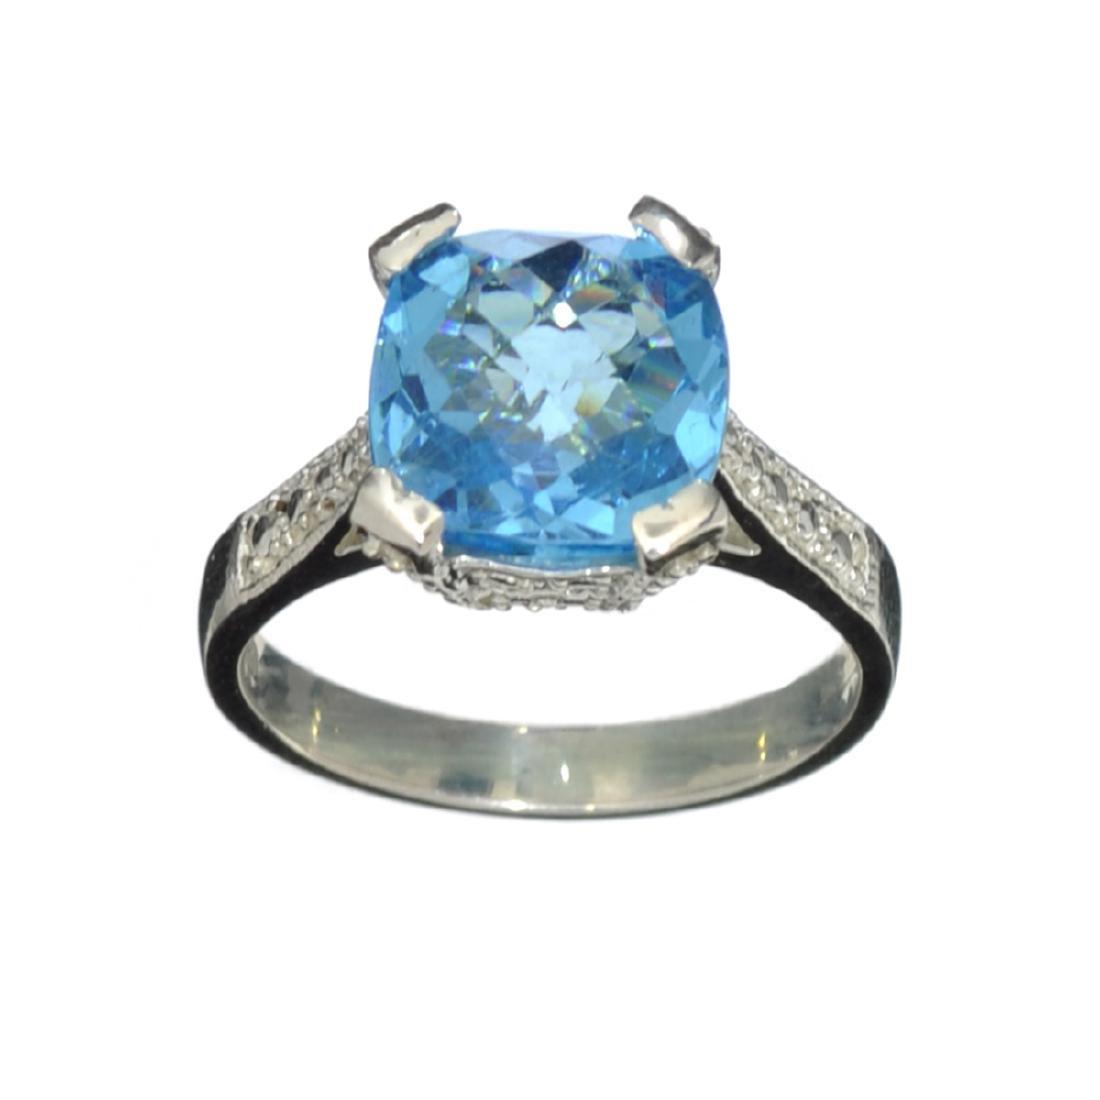 APP: 0.5k Fine Jewelry Designer Sebastian, 4.25CT